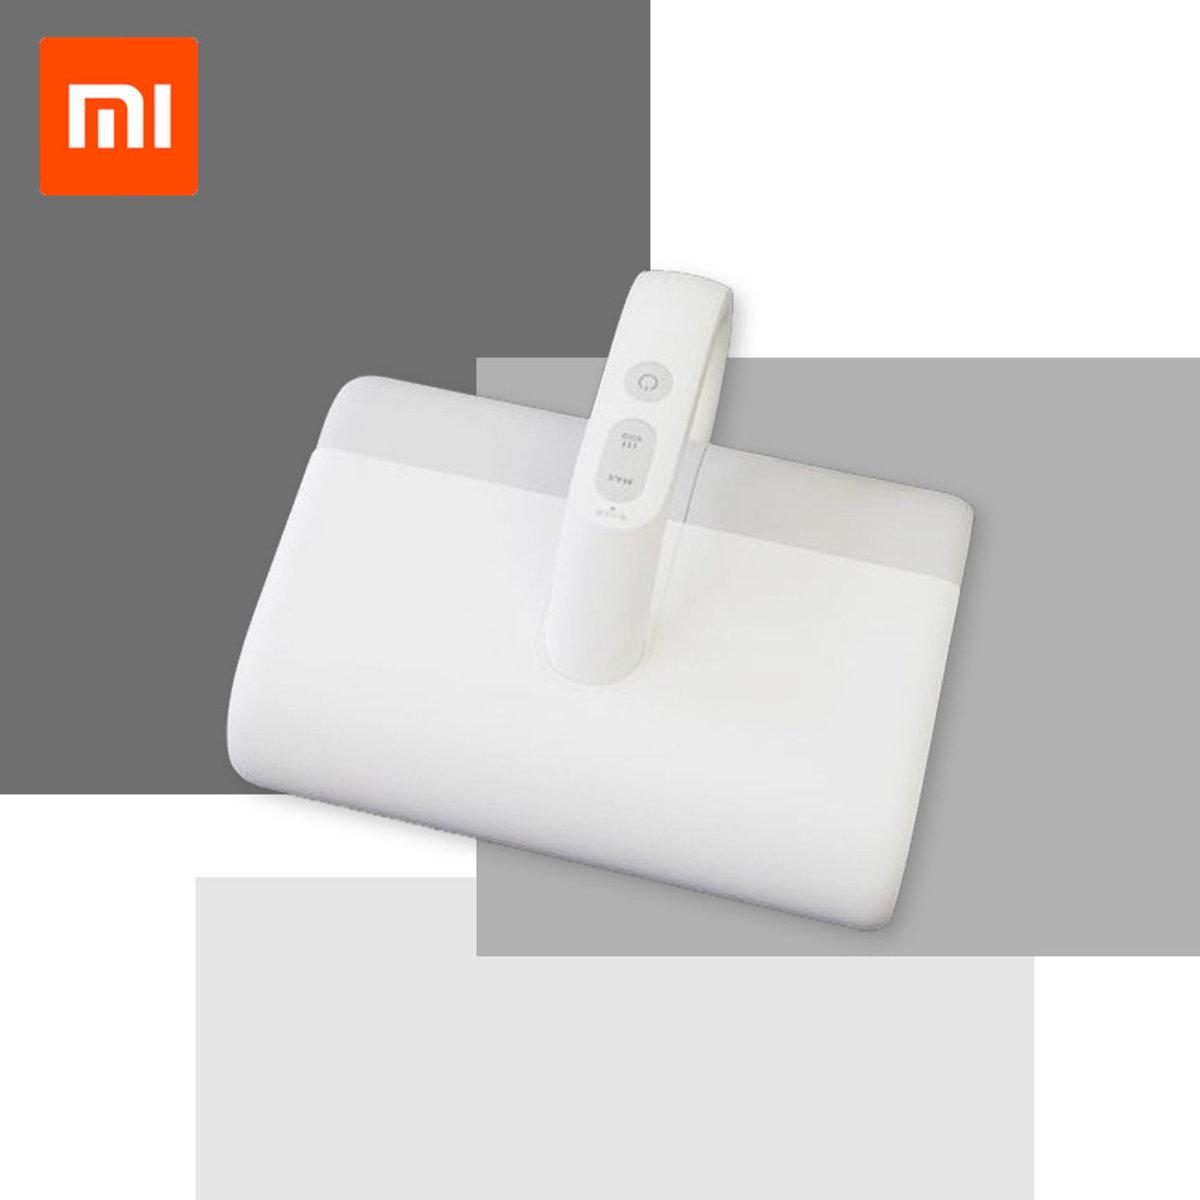 Xiaomi Wireless Bed Vacuum Cleaner - WXCMY01ZHM